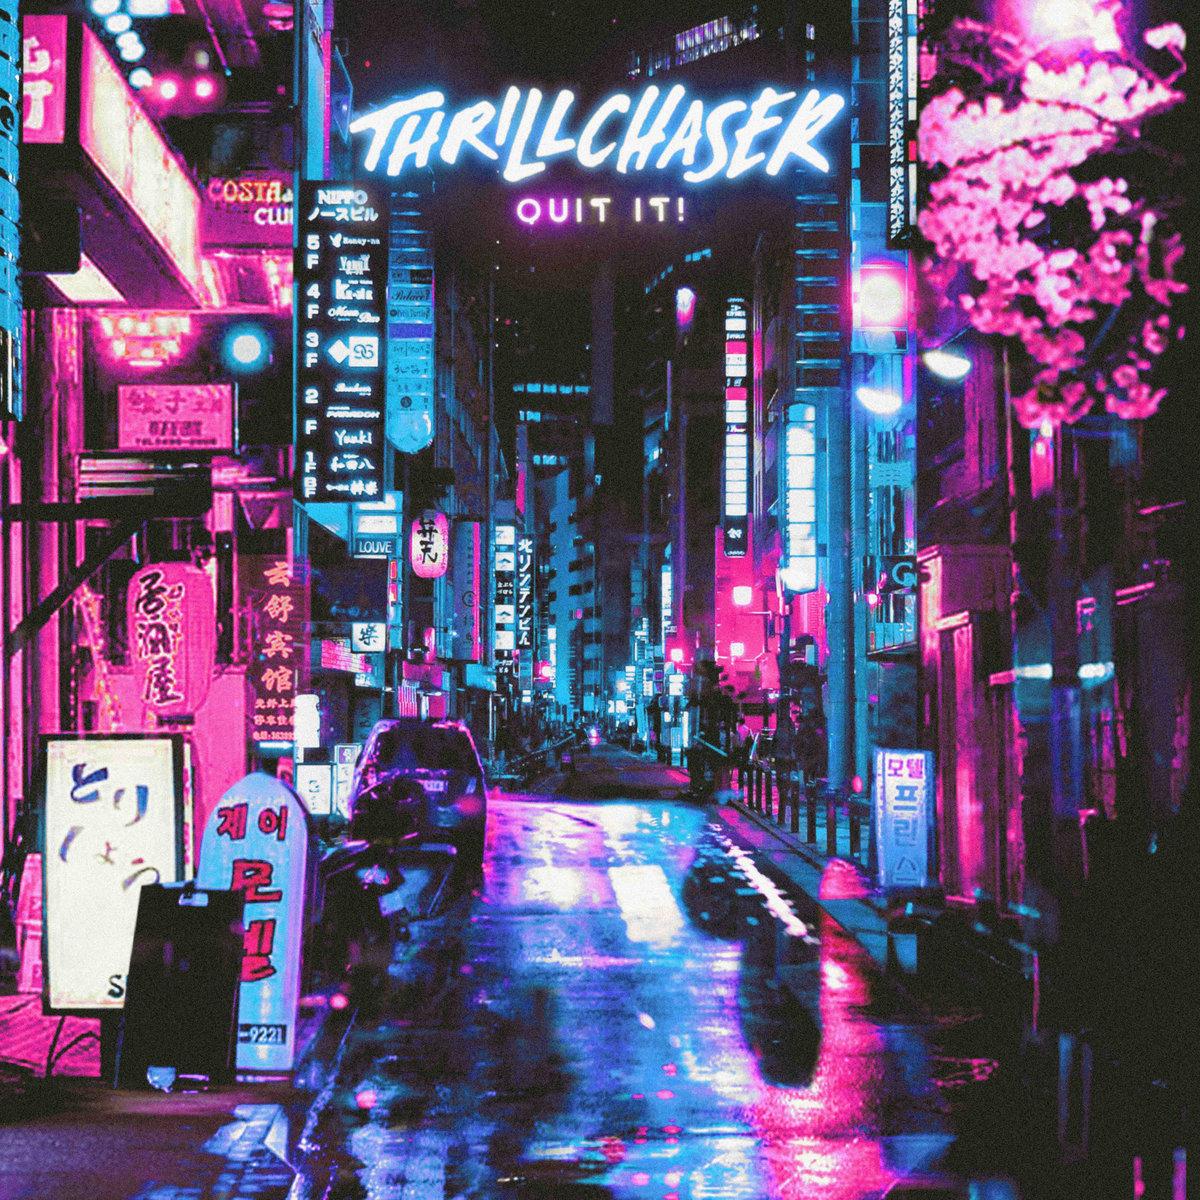 QUIT IT! by THRILLCHASER